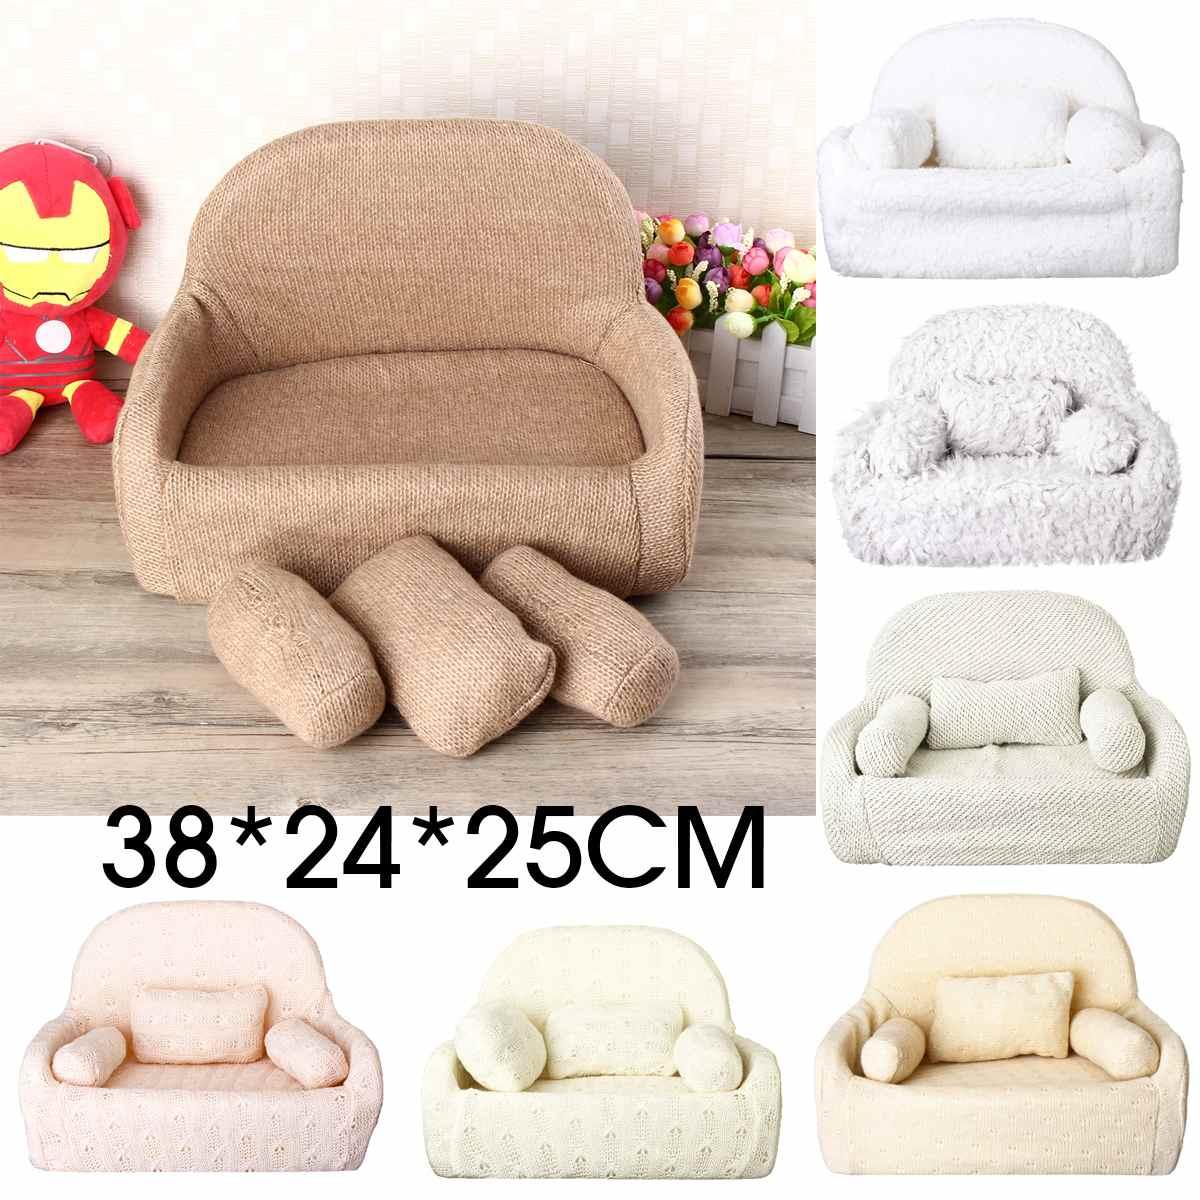 7 Styles Newborn Baby Sofa Chair Photography Prop Photo Baby Posing Chair+Pillow Set Mini Sofa Studio Shoot Backdrop Model Decor